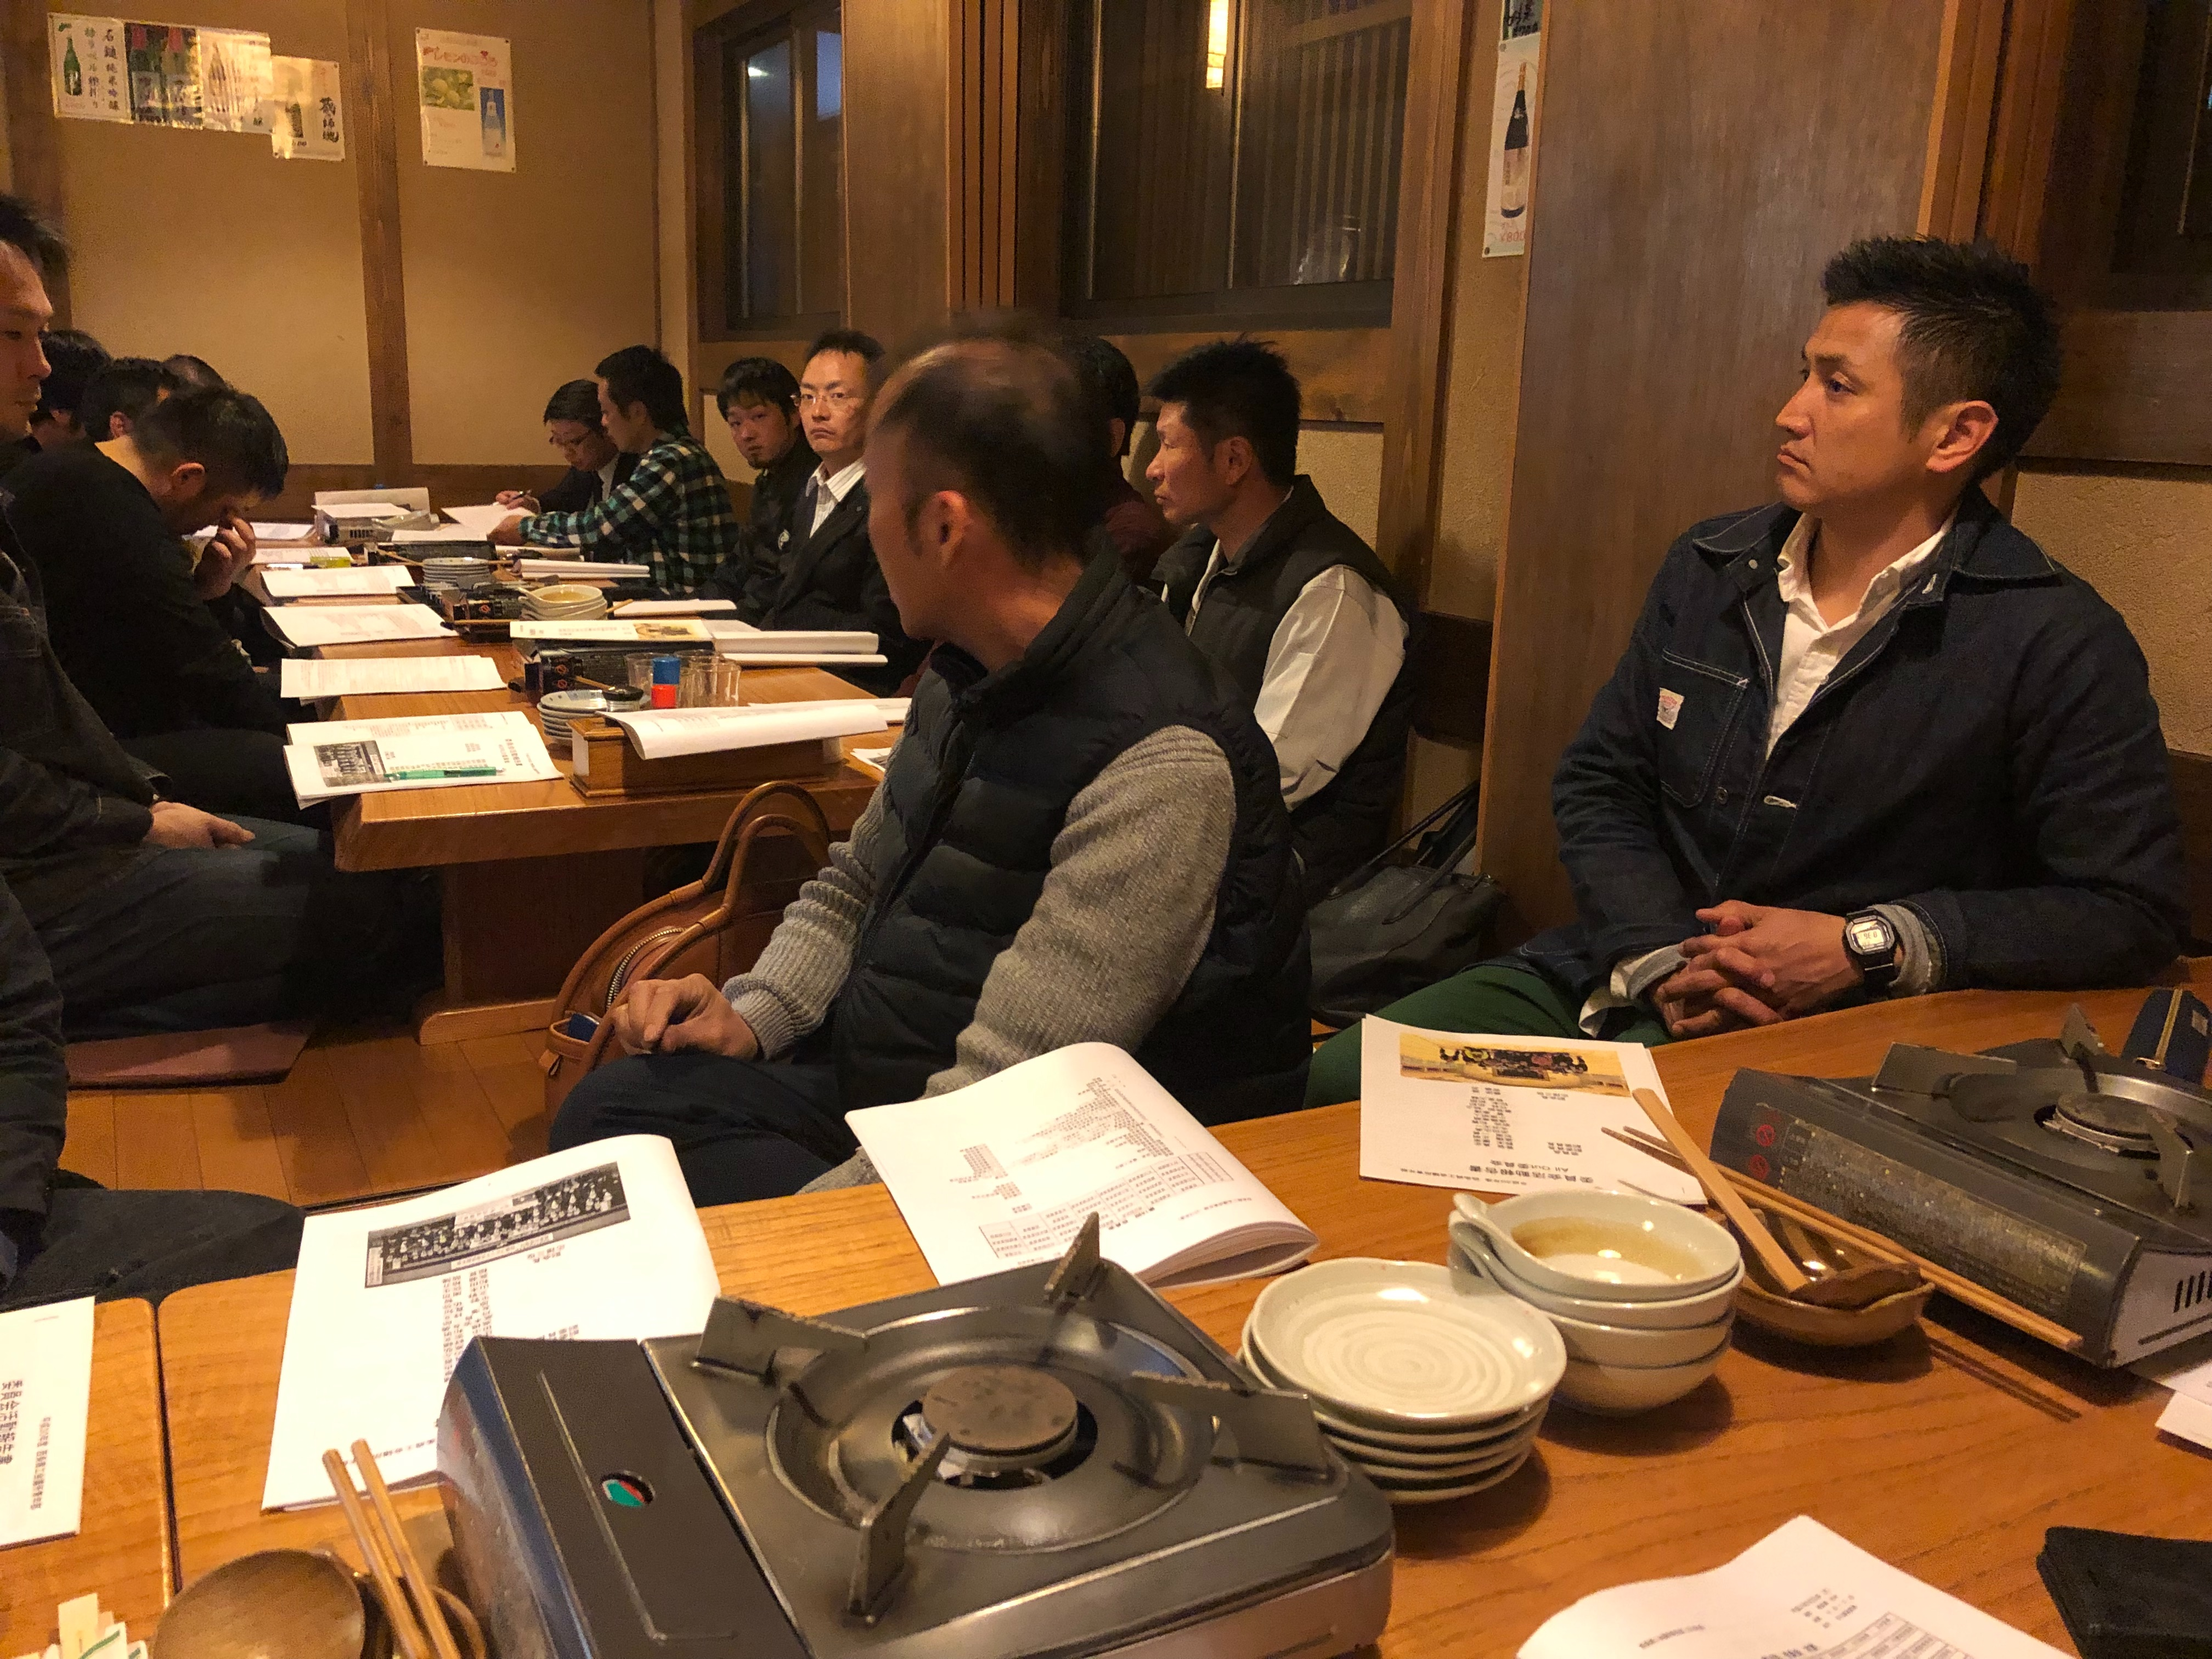 f:id:masanori-kato1972:20190326094606j:image